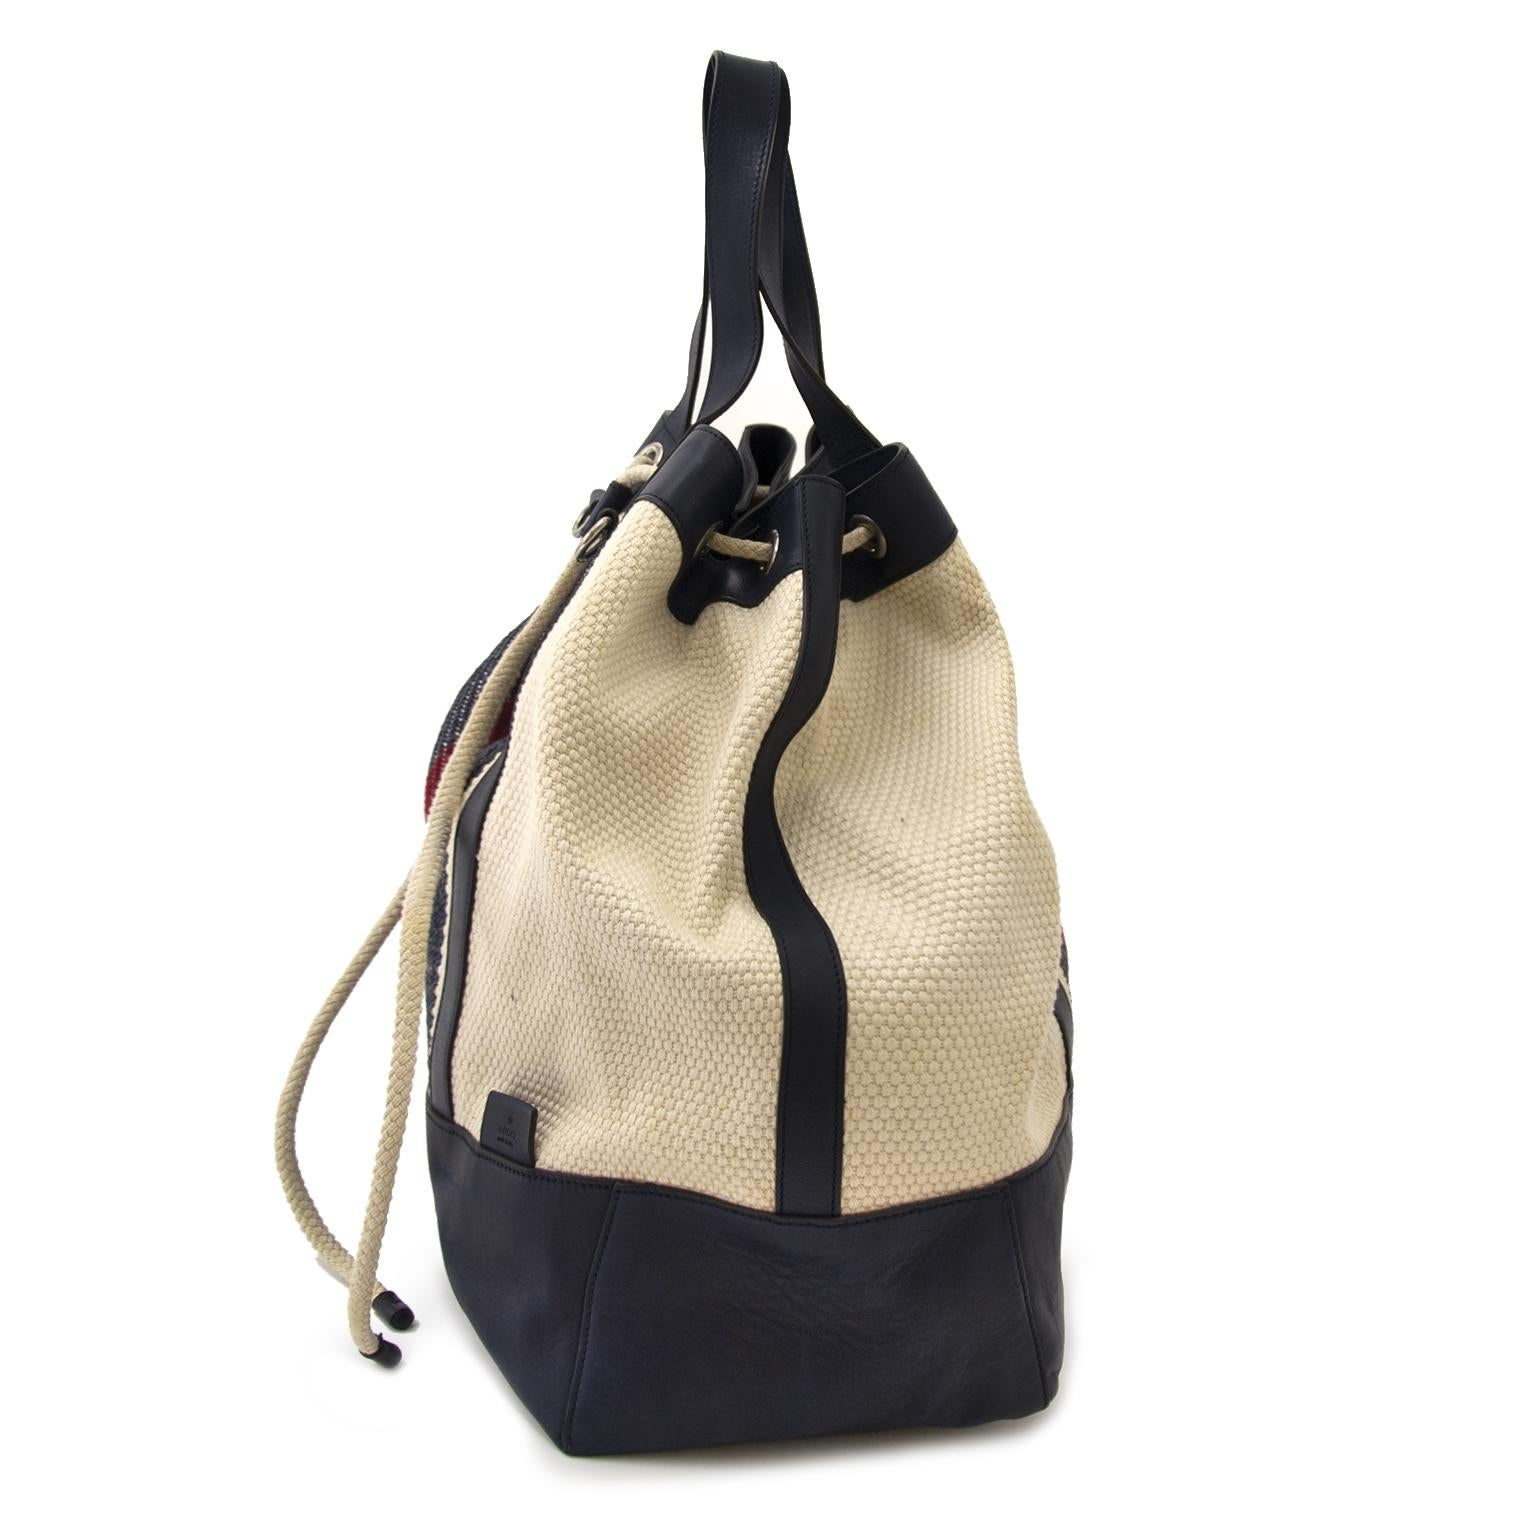 Gucci Large Drawstring Stripe Bucket Bag For Sale at 1stdibs